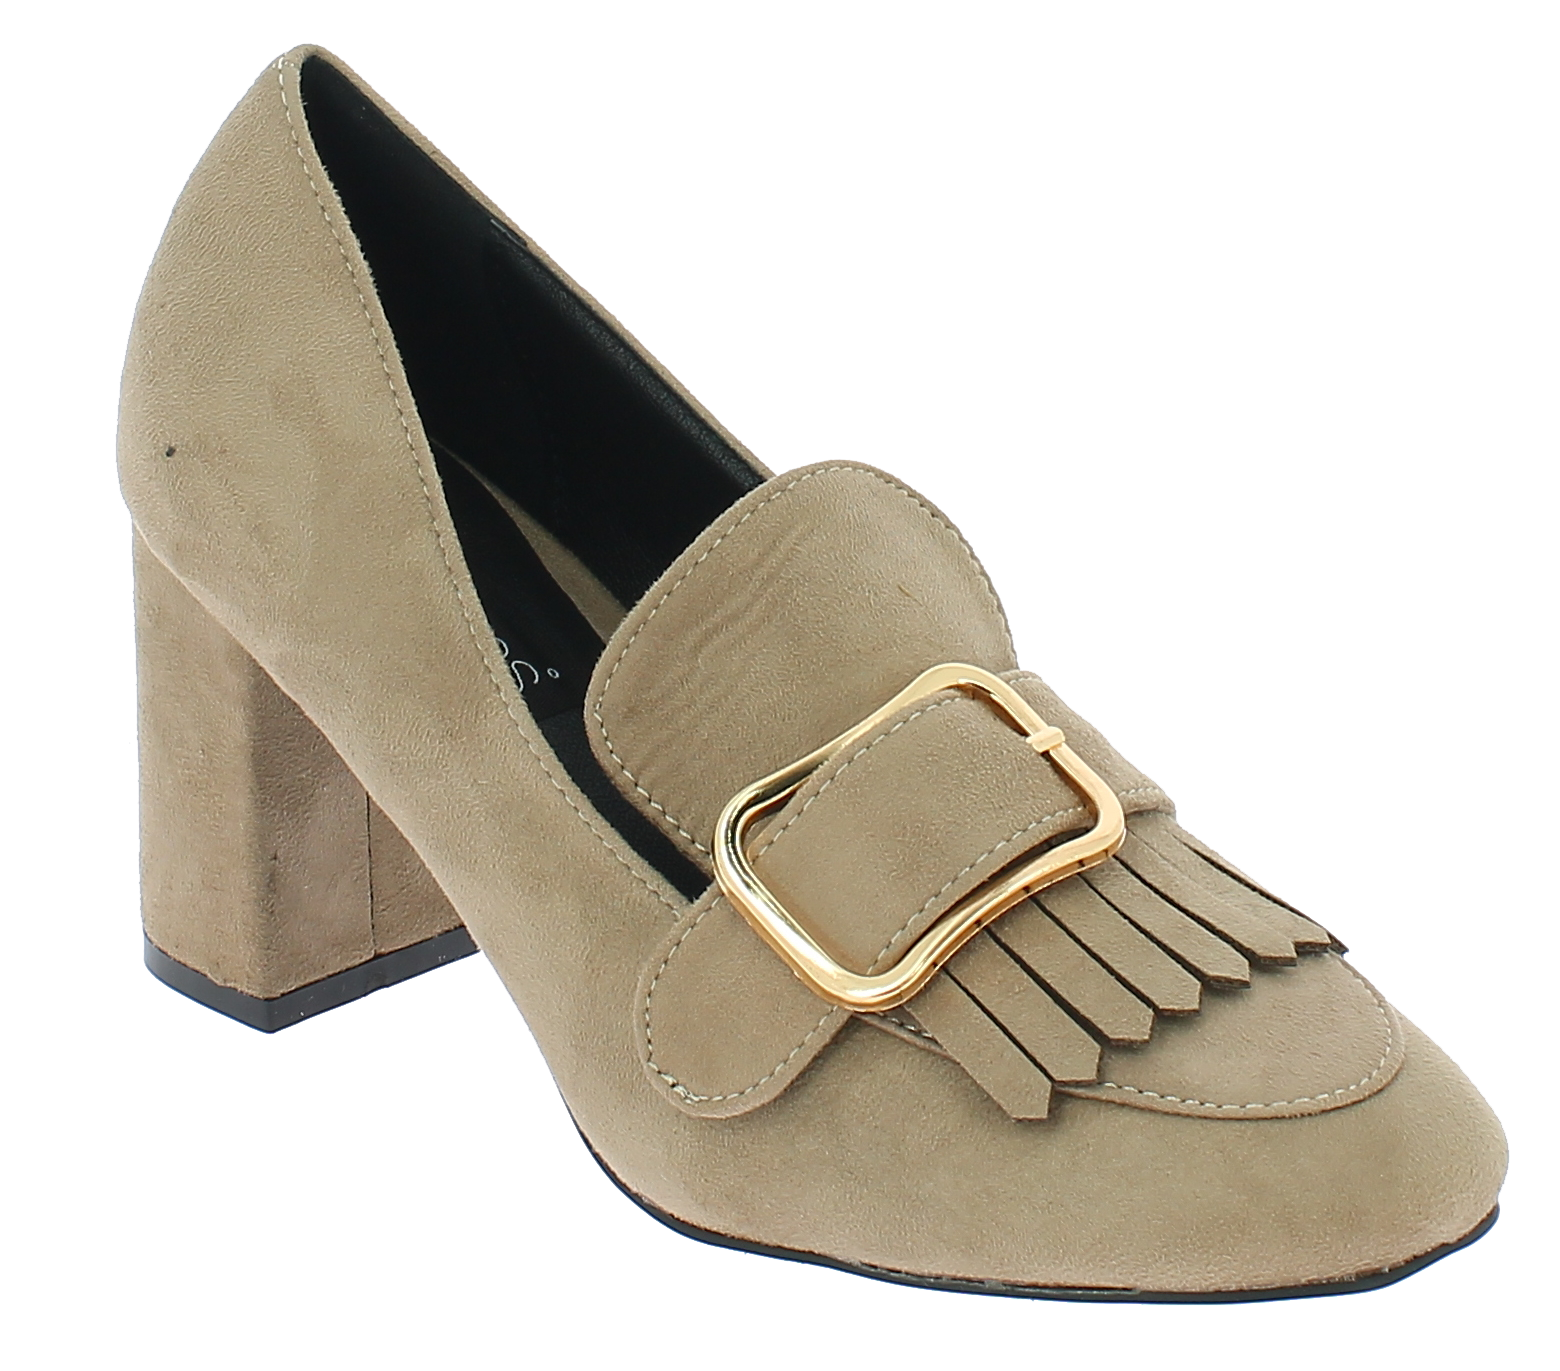 IQSHOES Γυναικεία Γόβα 17515 Μπέζ - IqShoes - 17515 BEIGE-beige-36/1/7/7 παπούτσια  new in